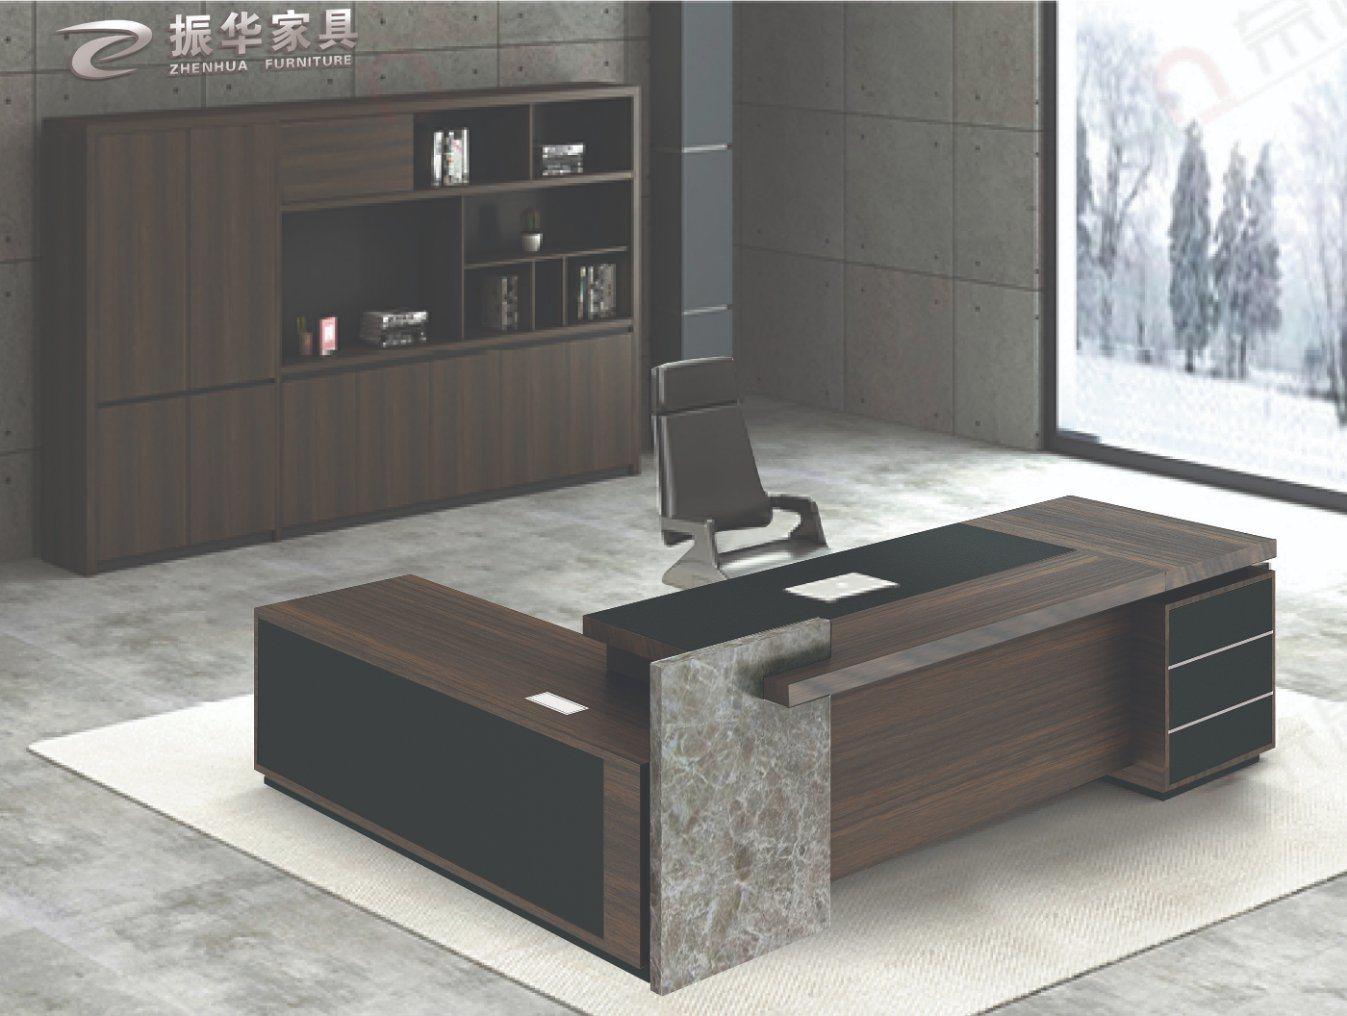 China Escritorio Modern Luxury Big Boss Table Desk Design Home Executive Office Desk China Office Table Office Furniture